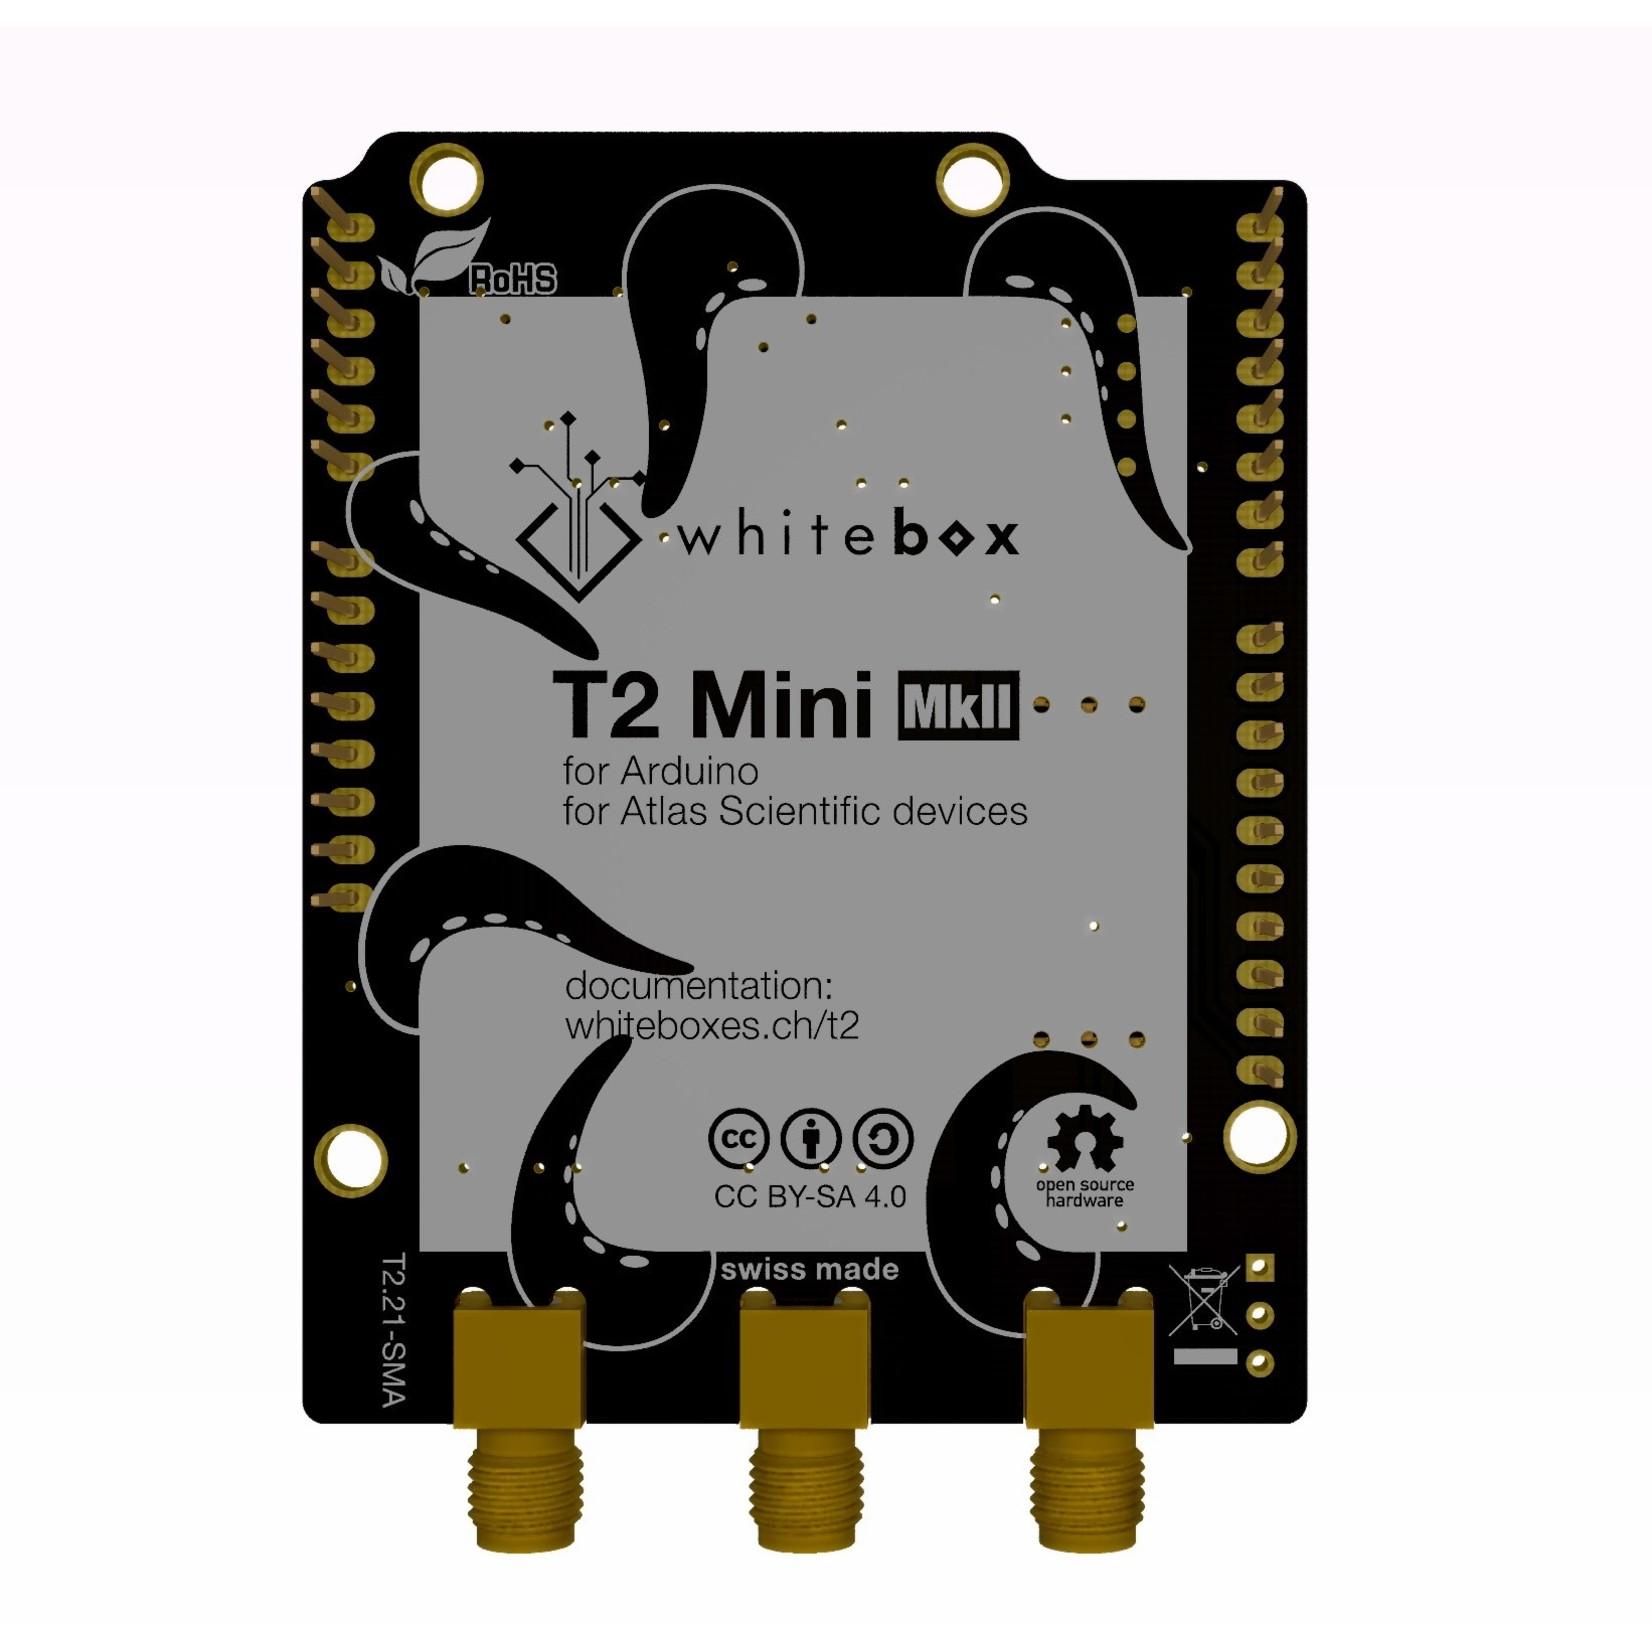 Whitebox Labs Whitebox T2 Mini MkII